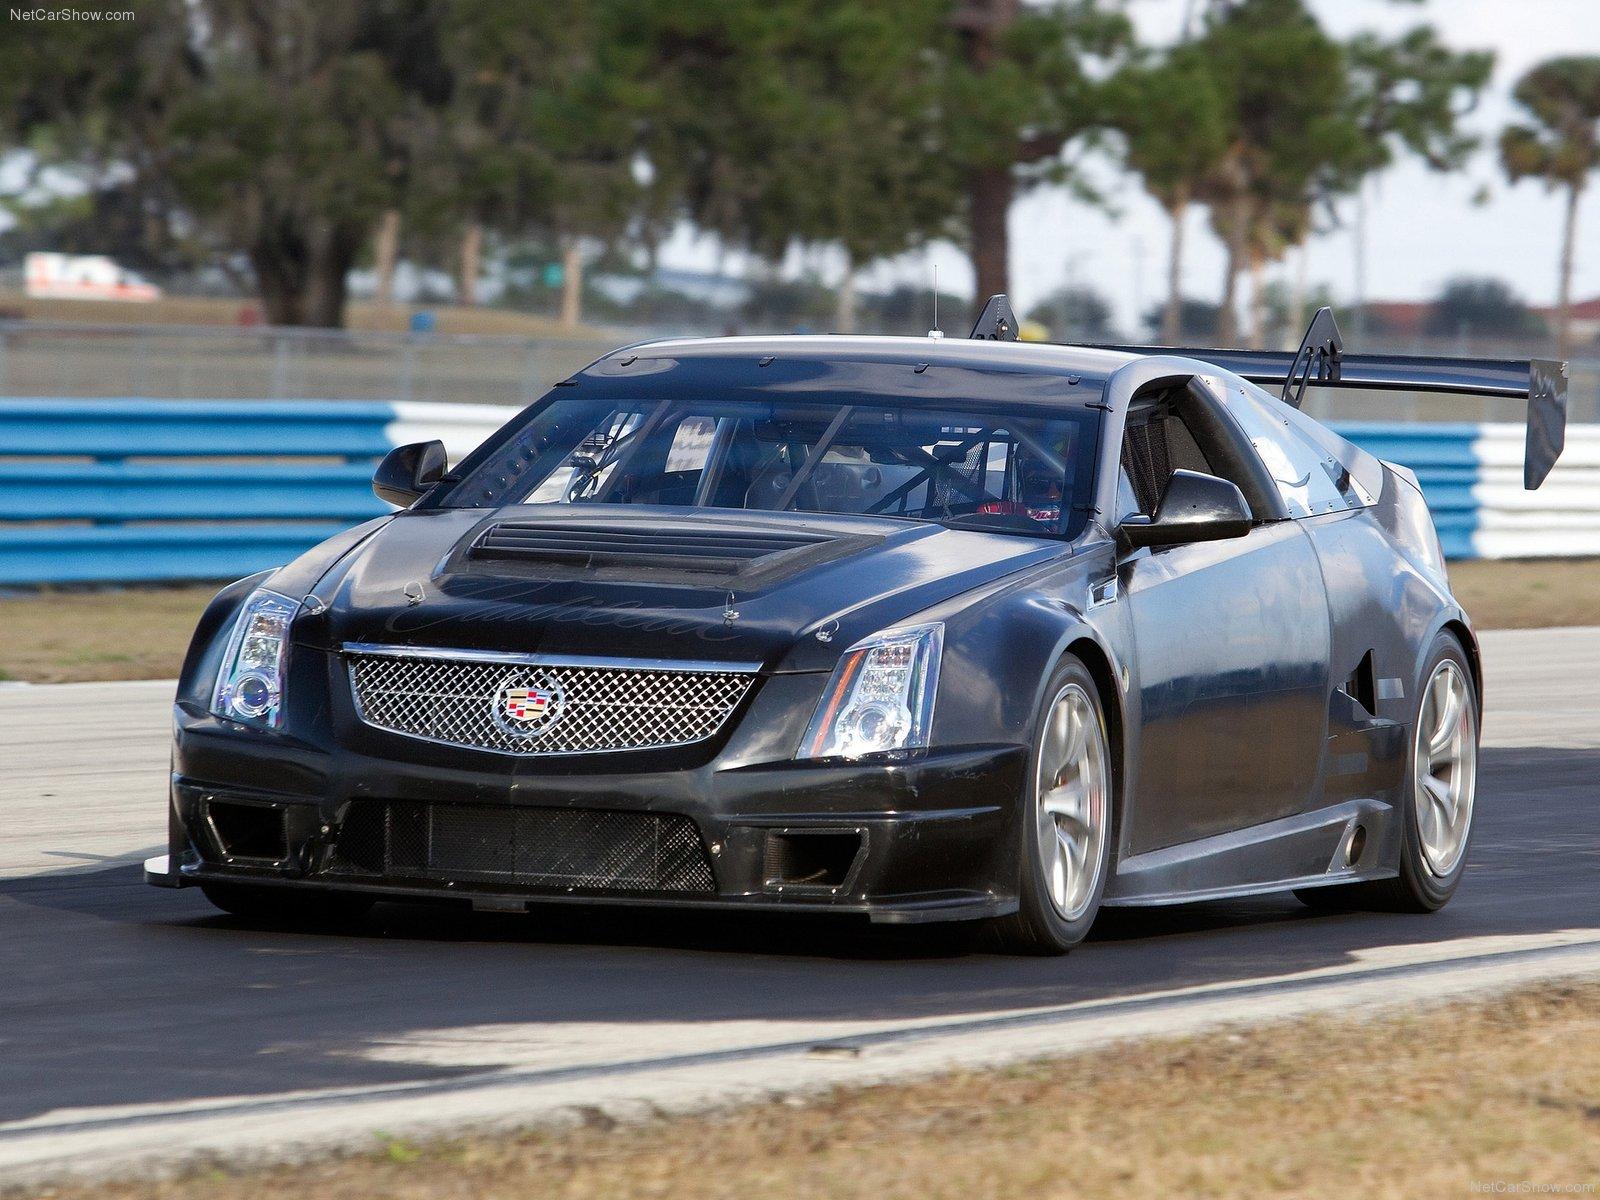 Cadillac Cts V Coupe Race Car Photo 113215